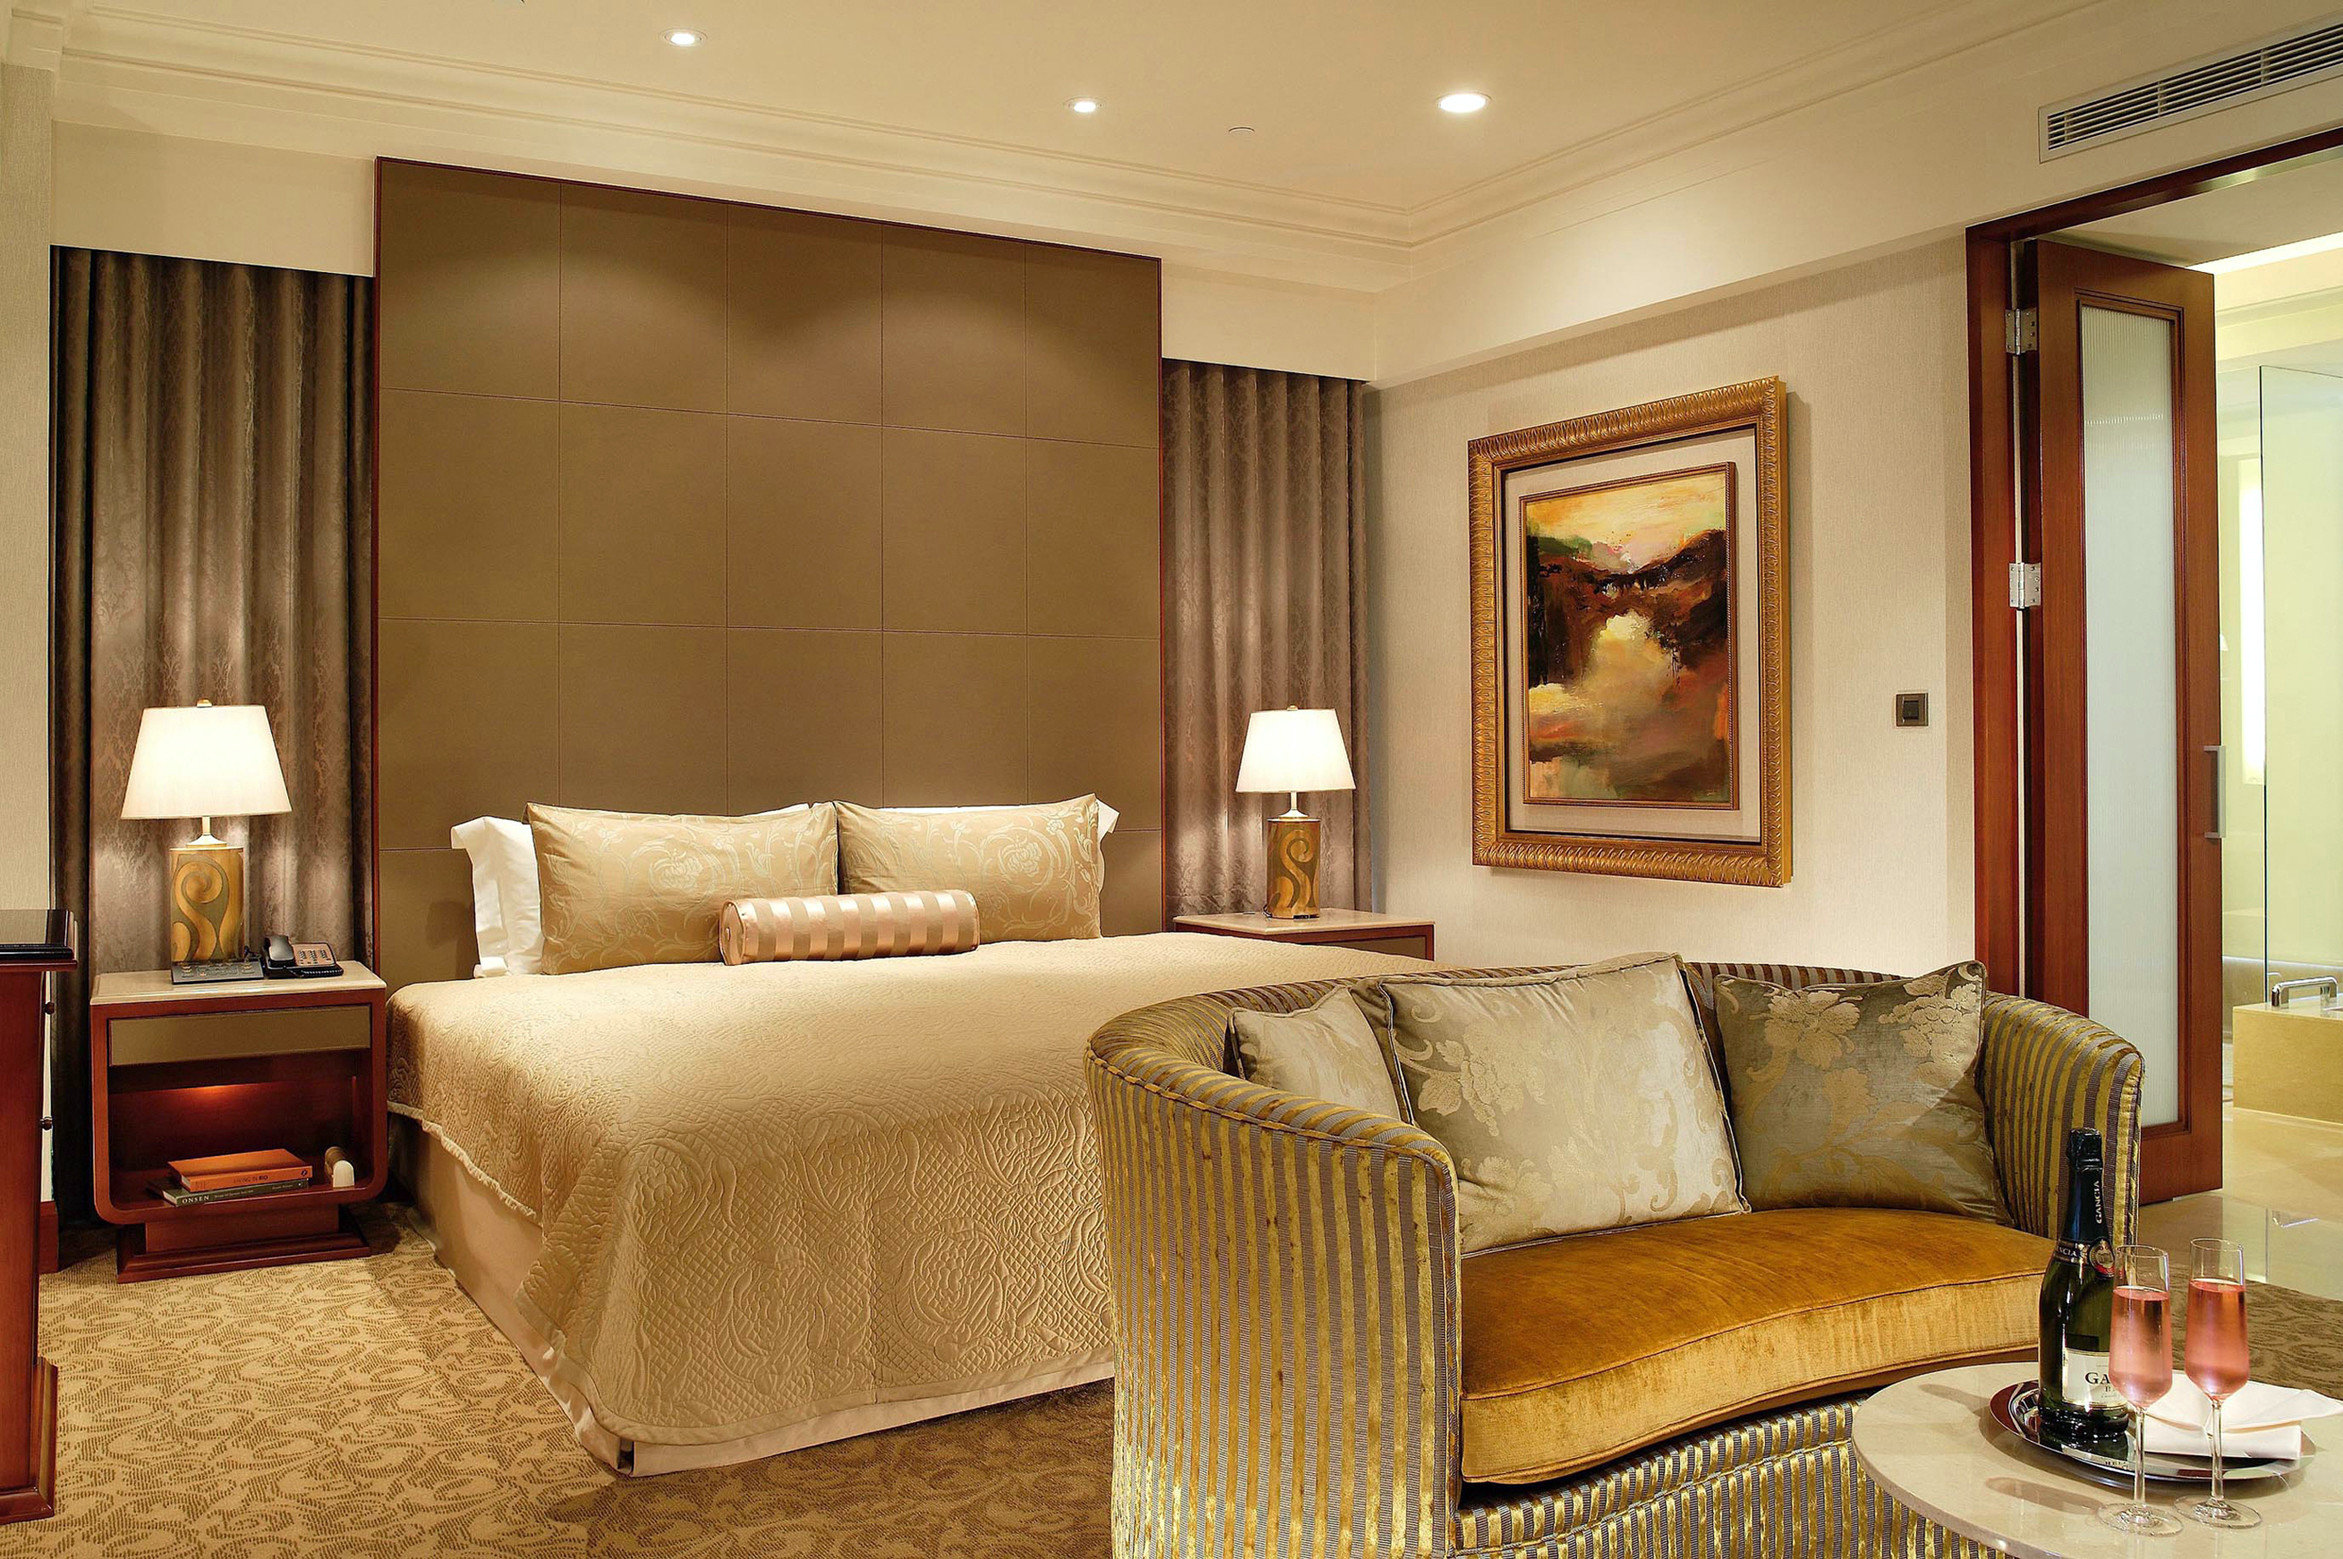 sofa living room property Suite condominium home Bedroom tan